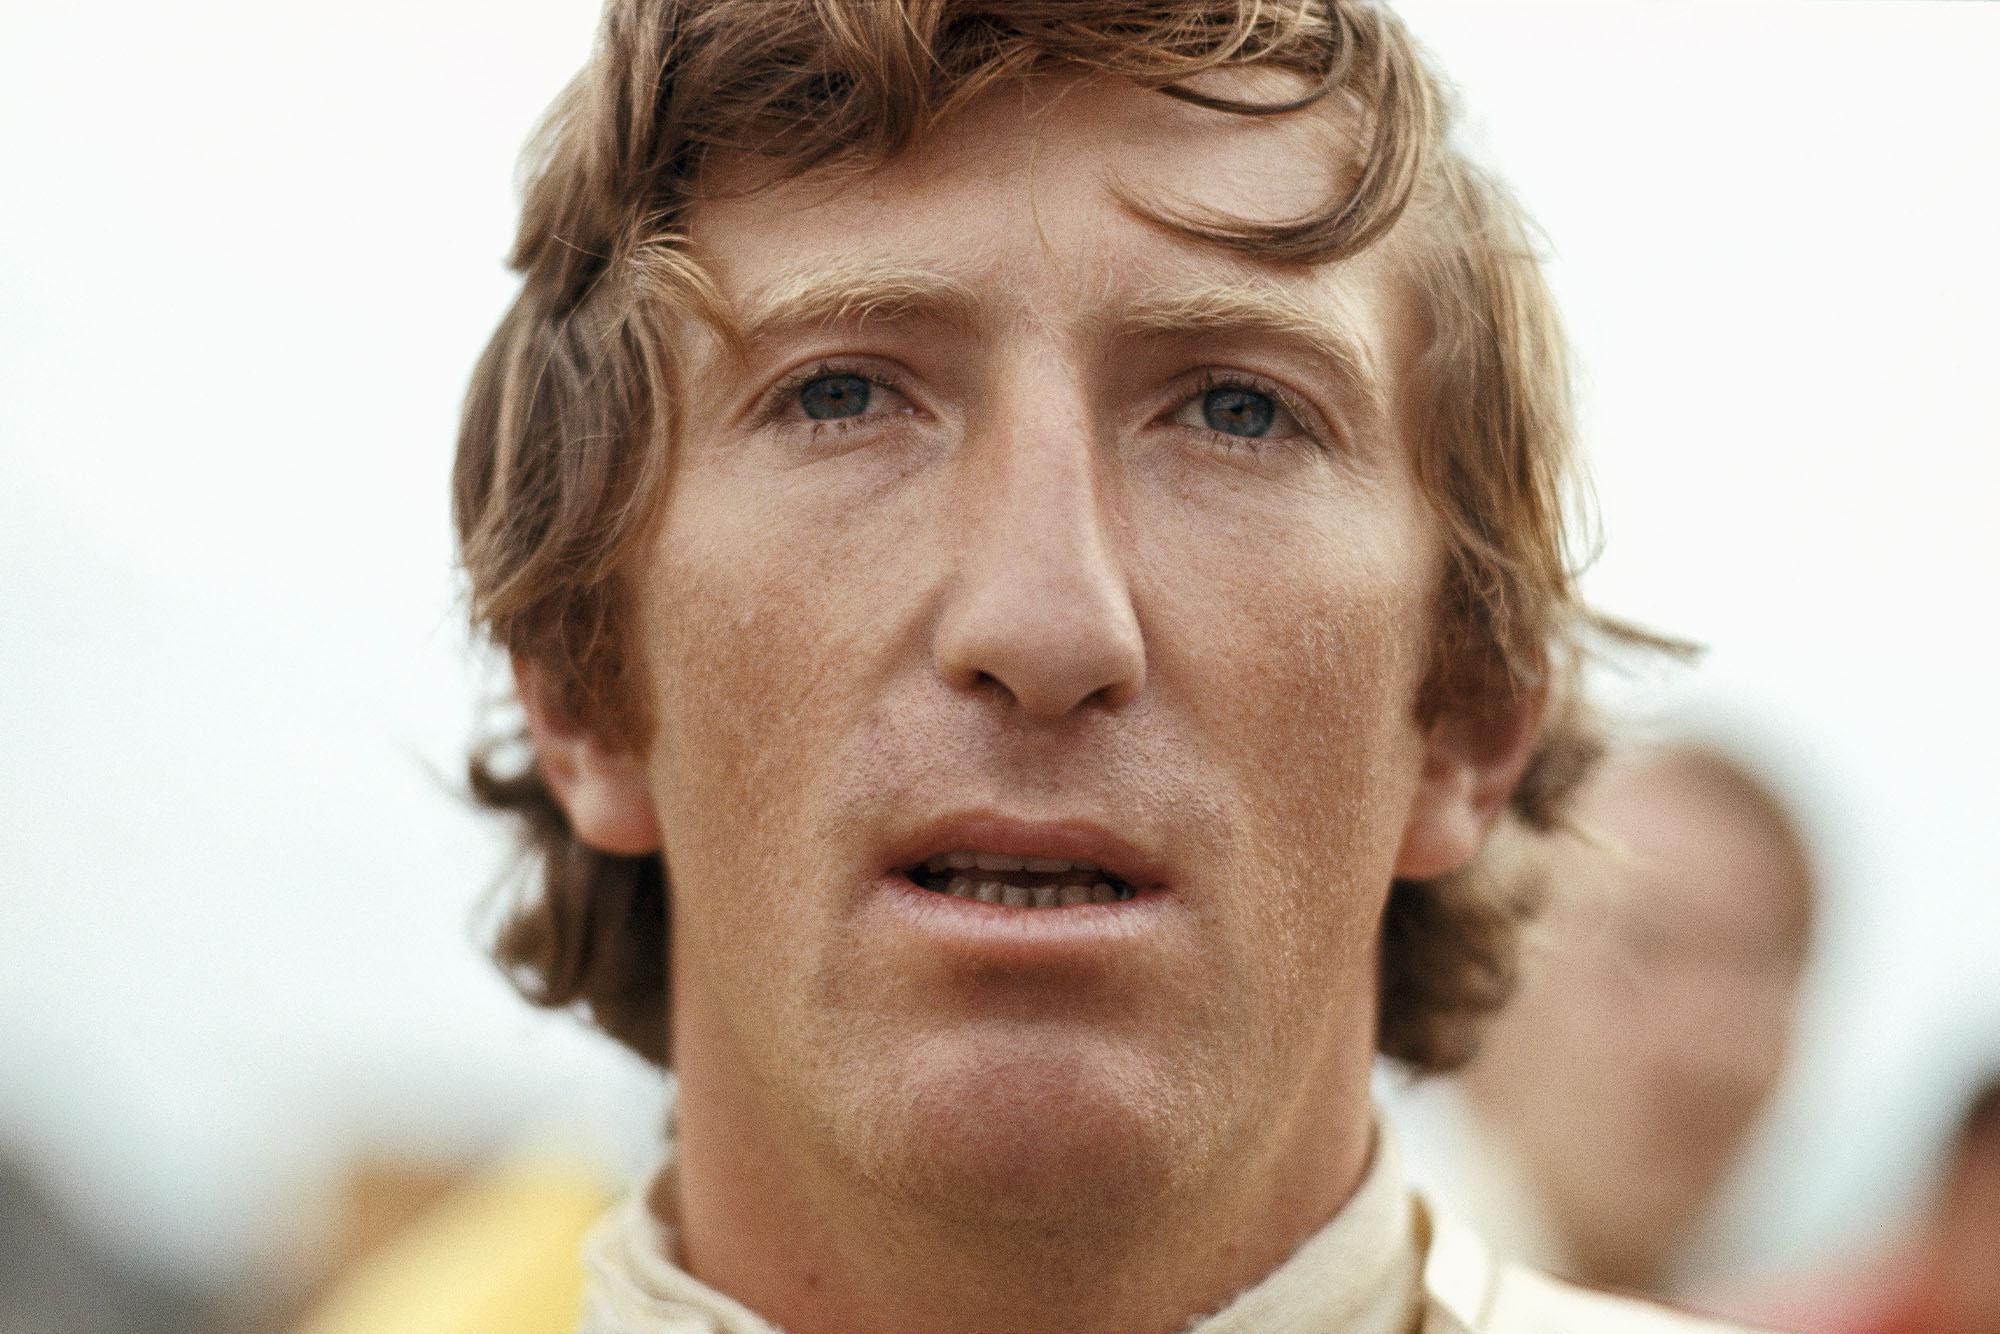 Lotus driver Jochen Rindt pictured at the 1970 Italian Grand Prix